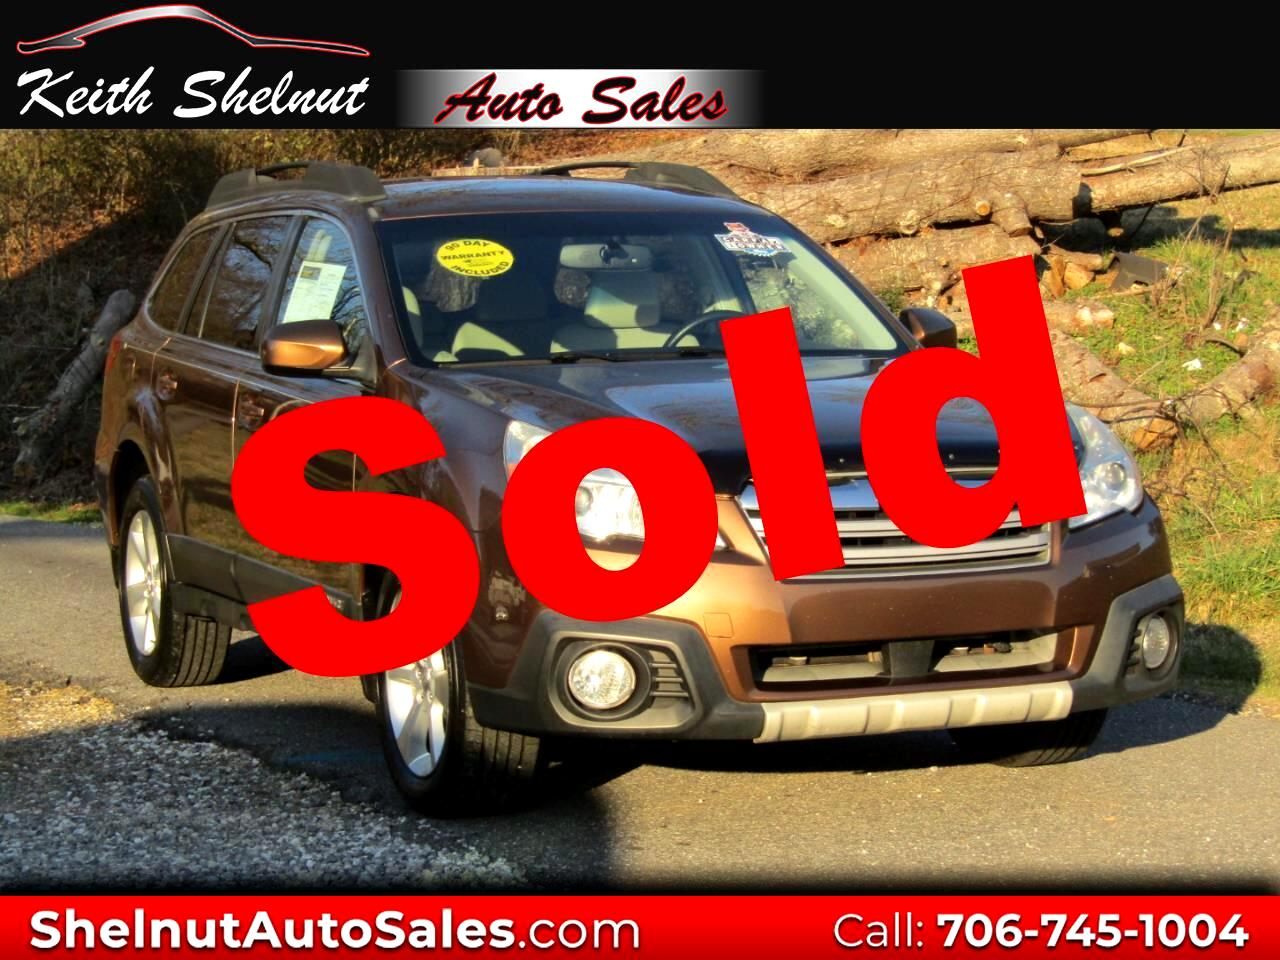 Subaru Outback 4dr Wgn H4 Auto 2.5i Limited 2013